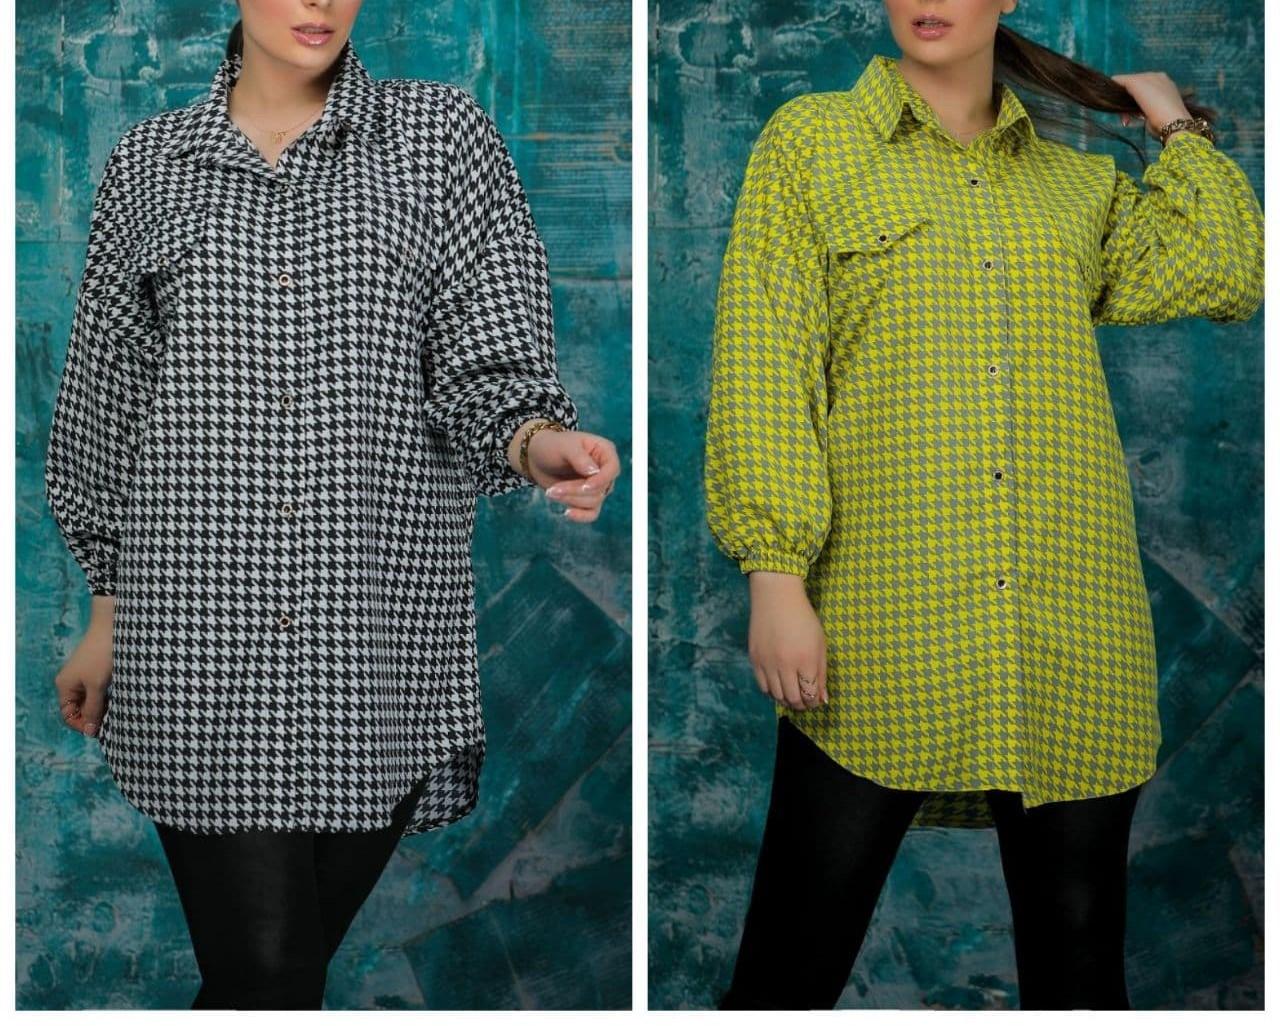 New model spring clothes 1400 pabak.ir 15 - مدل های جدید لباس بهار ۱۴۰۰ + عکس